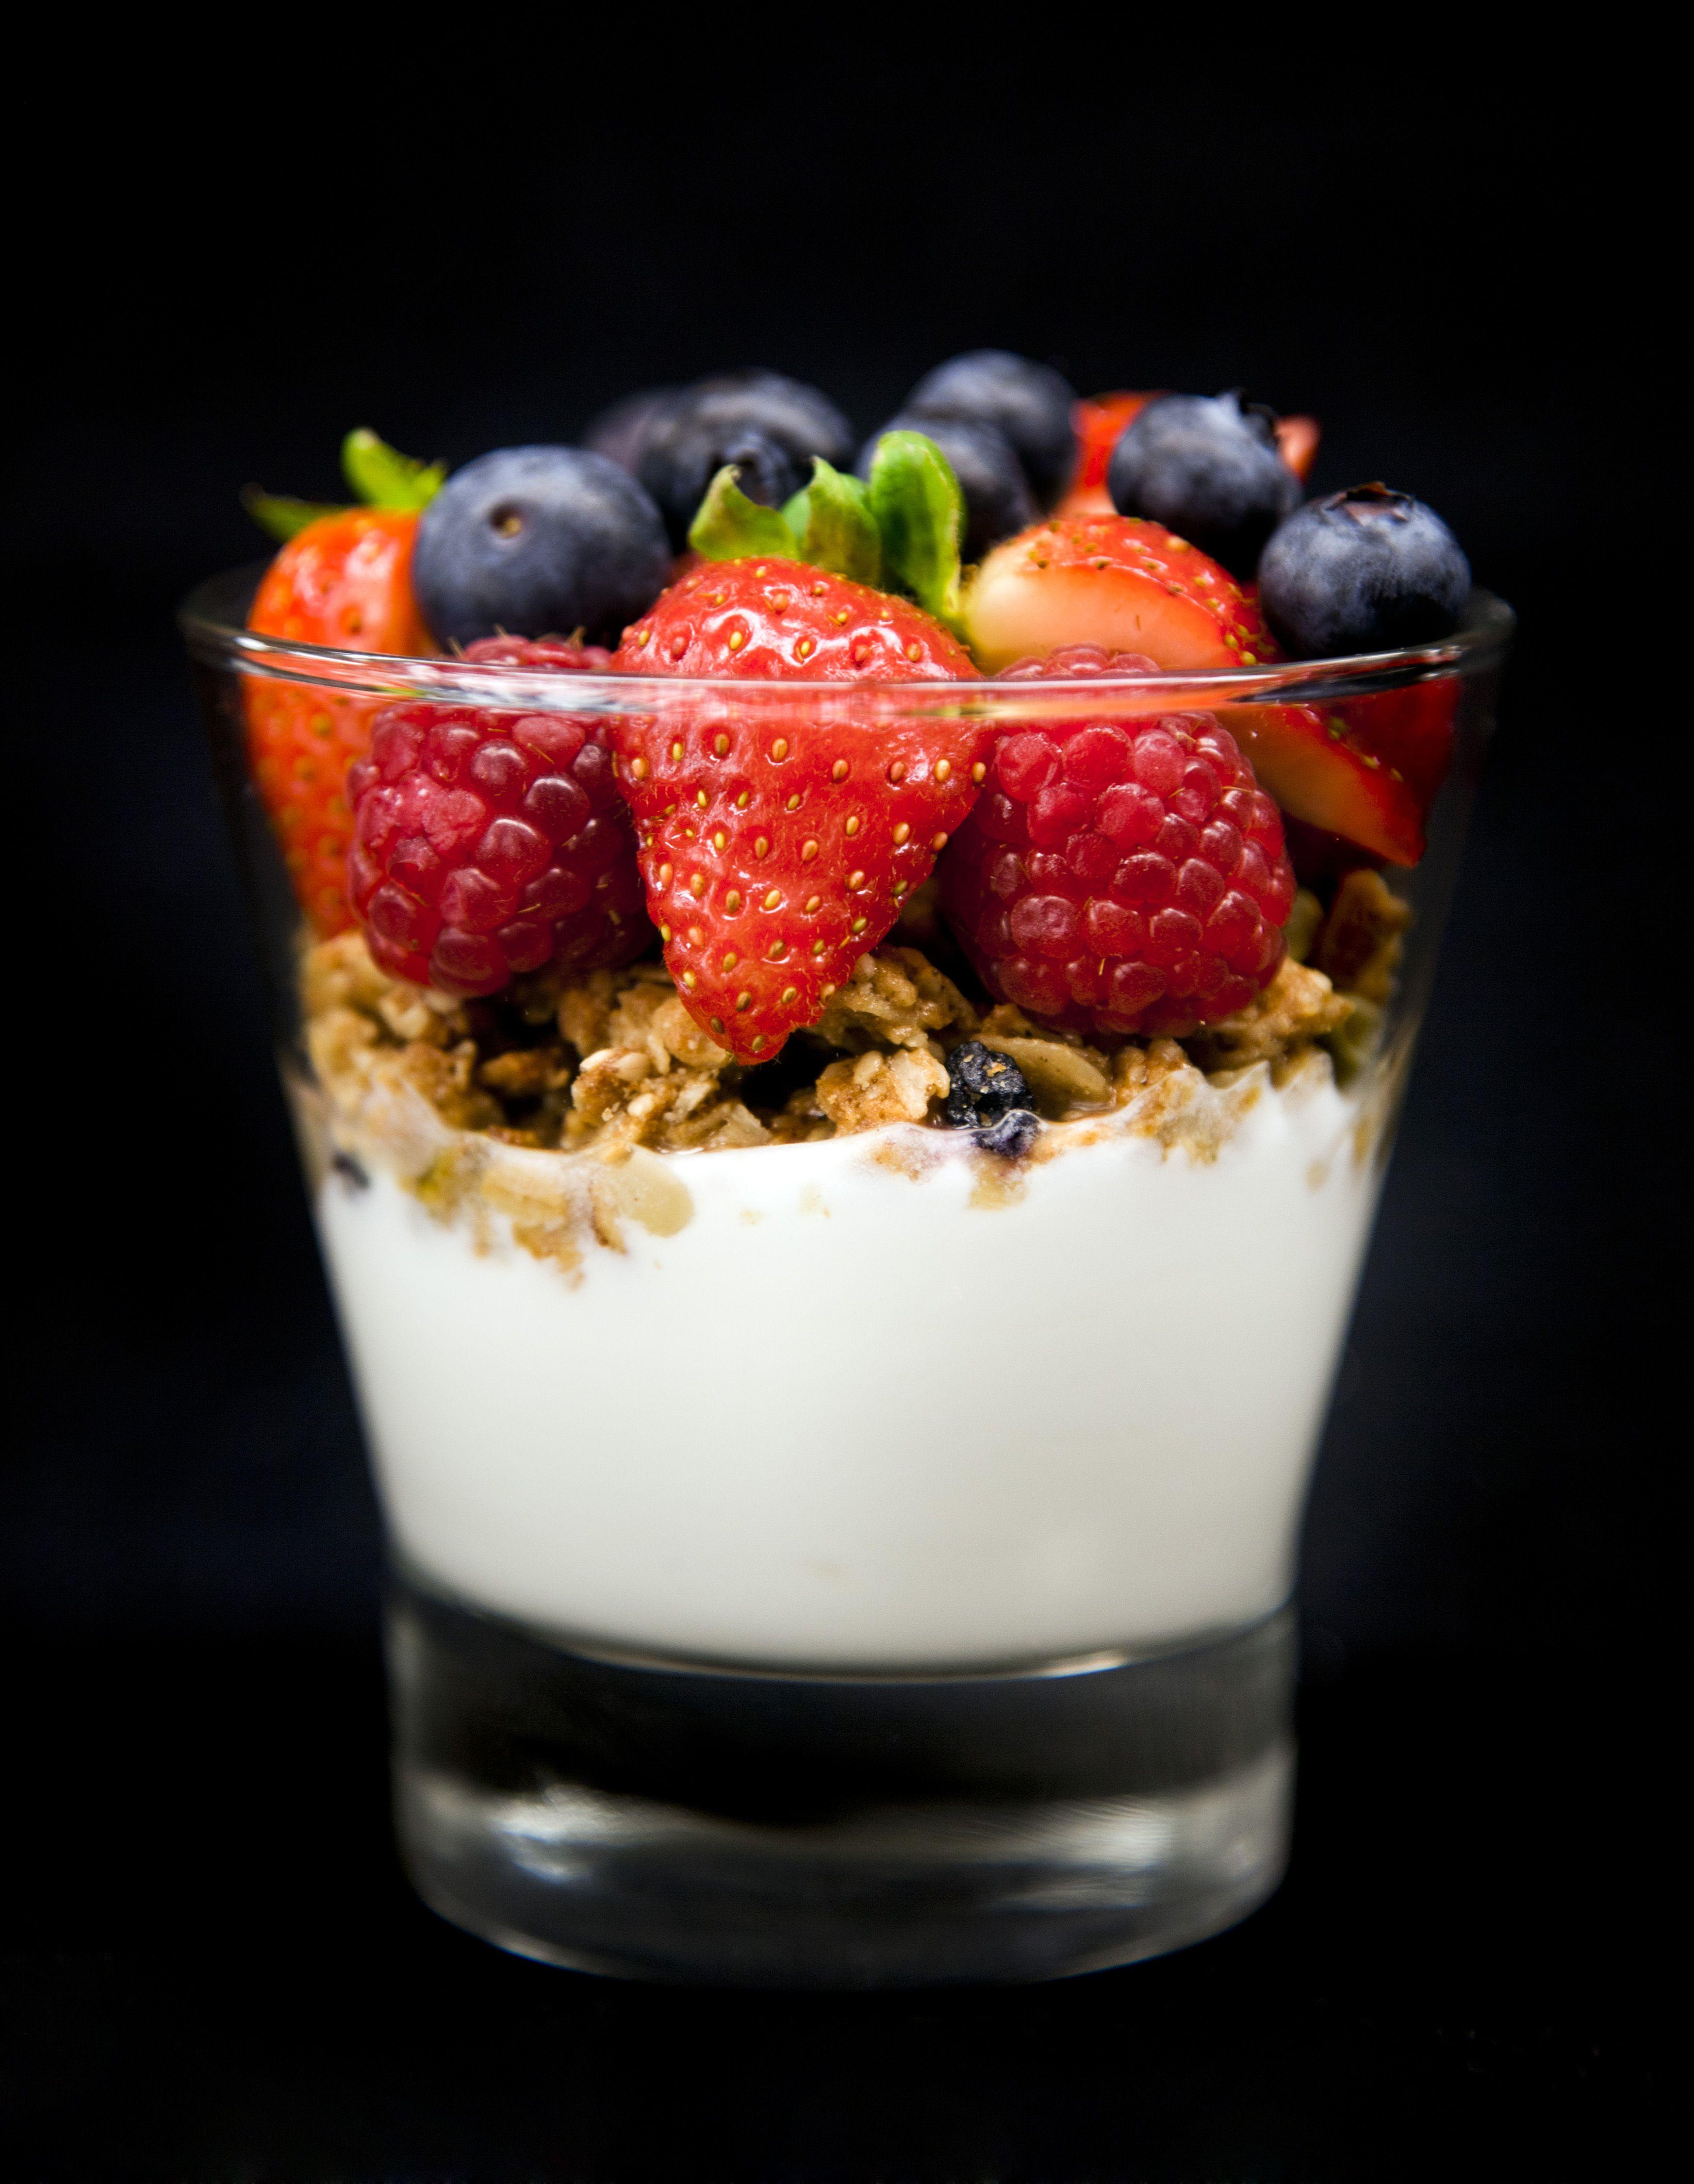 my favourite breakfast food, berry yogurt parfait...also a ...